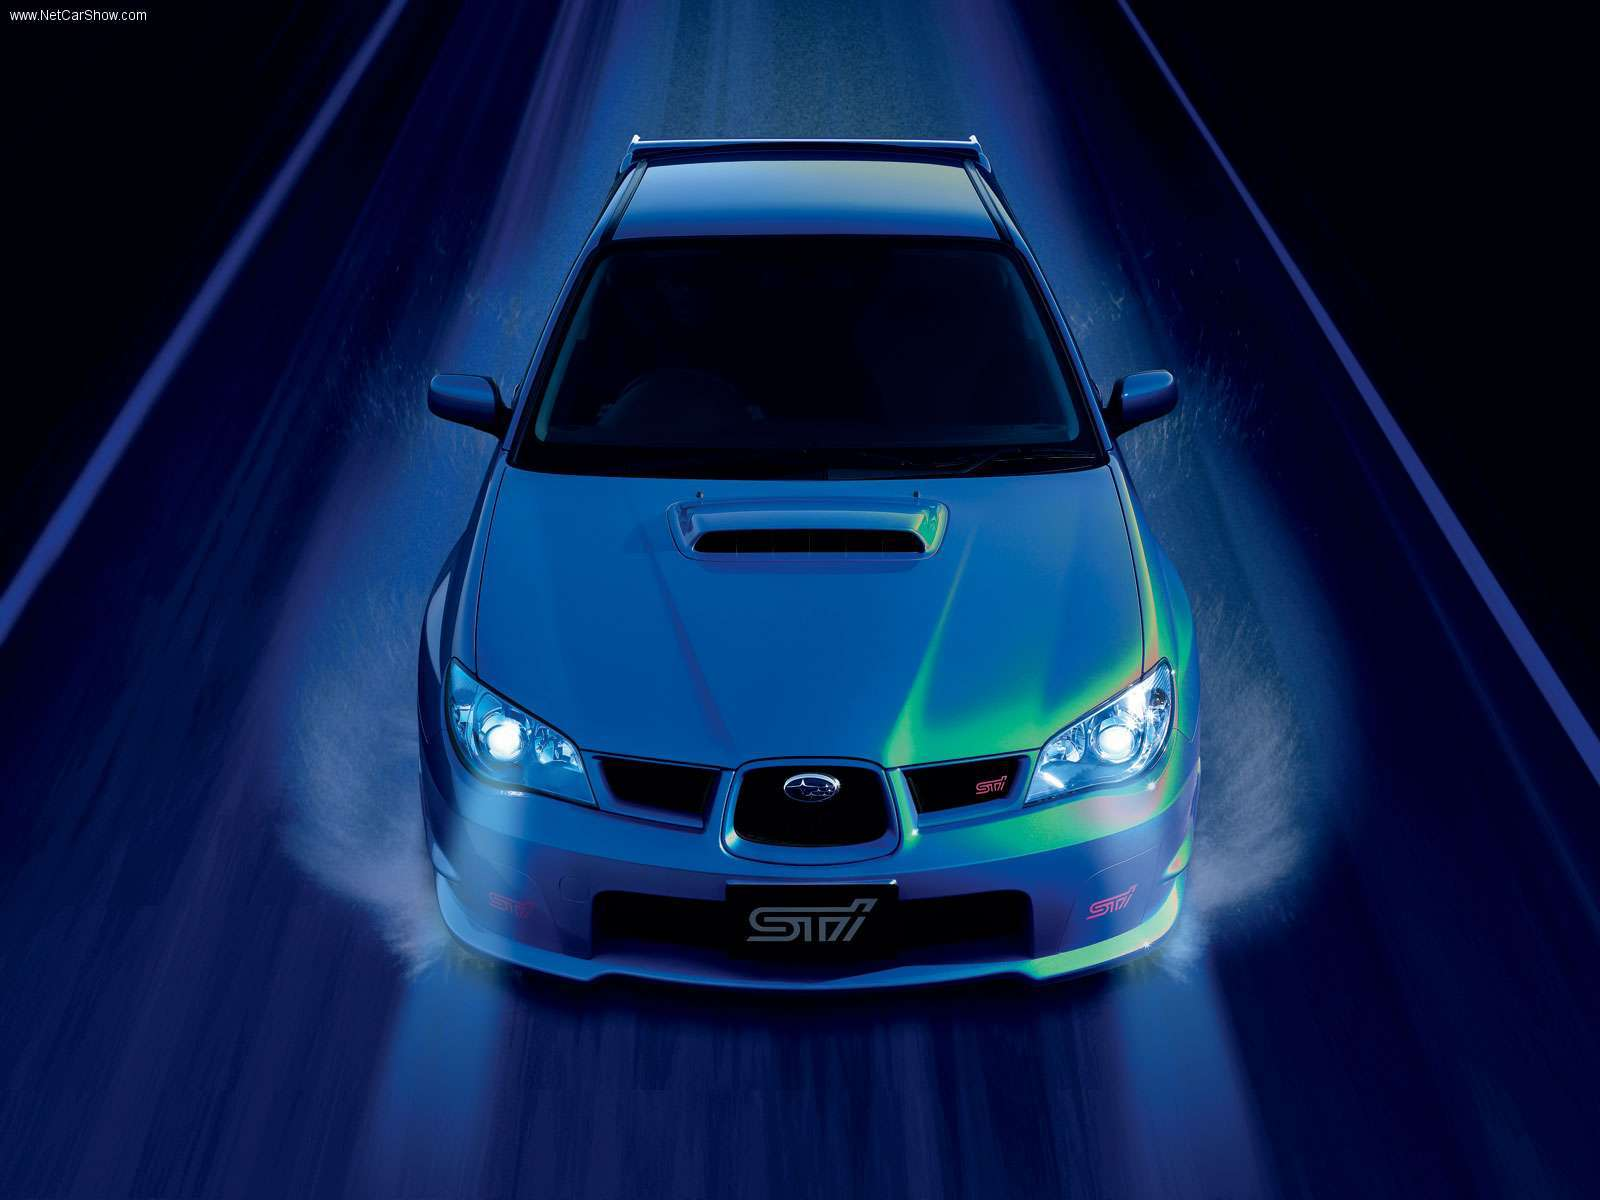 Subaru impreza wrx sti wallpaper hd hd4wallpaper net